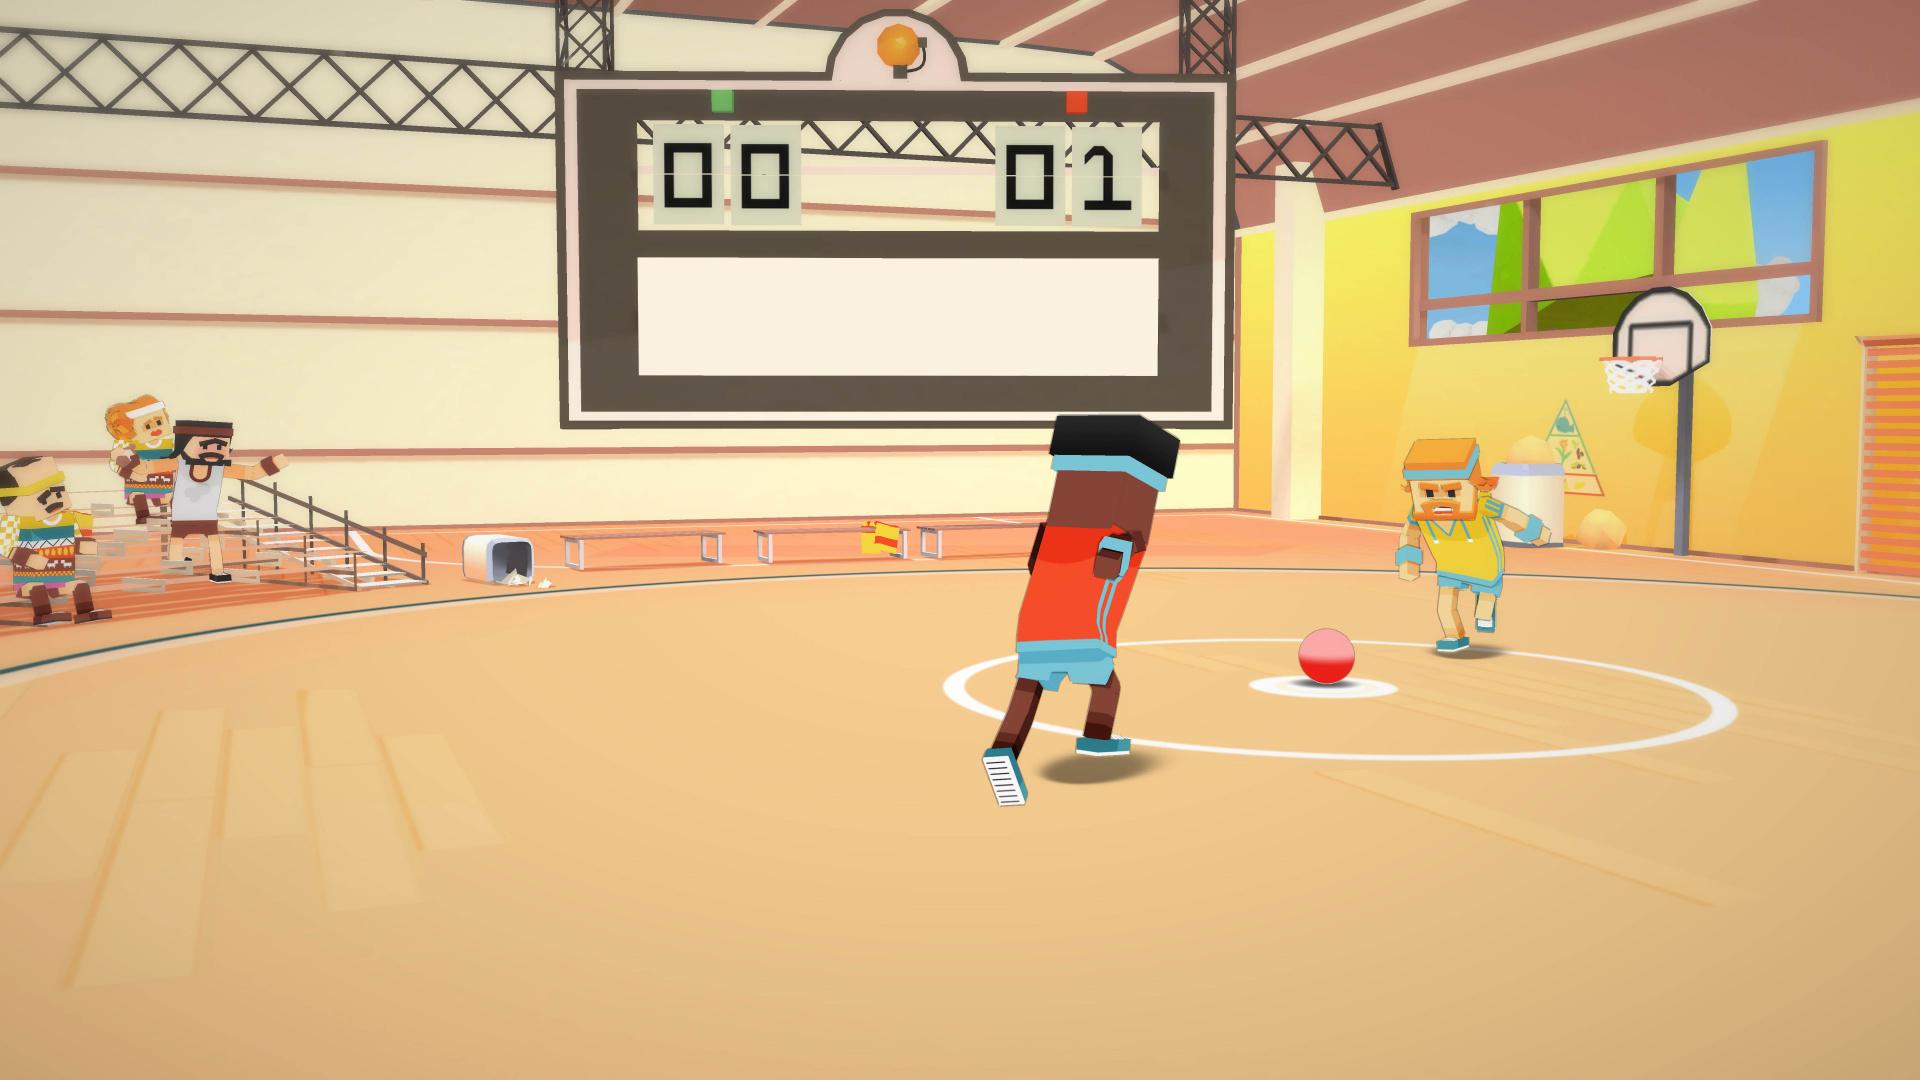 stikbold  dodgeball adventure ps playstation  news reviews trailer screenshots